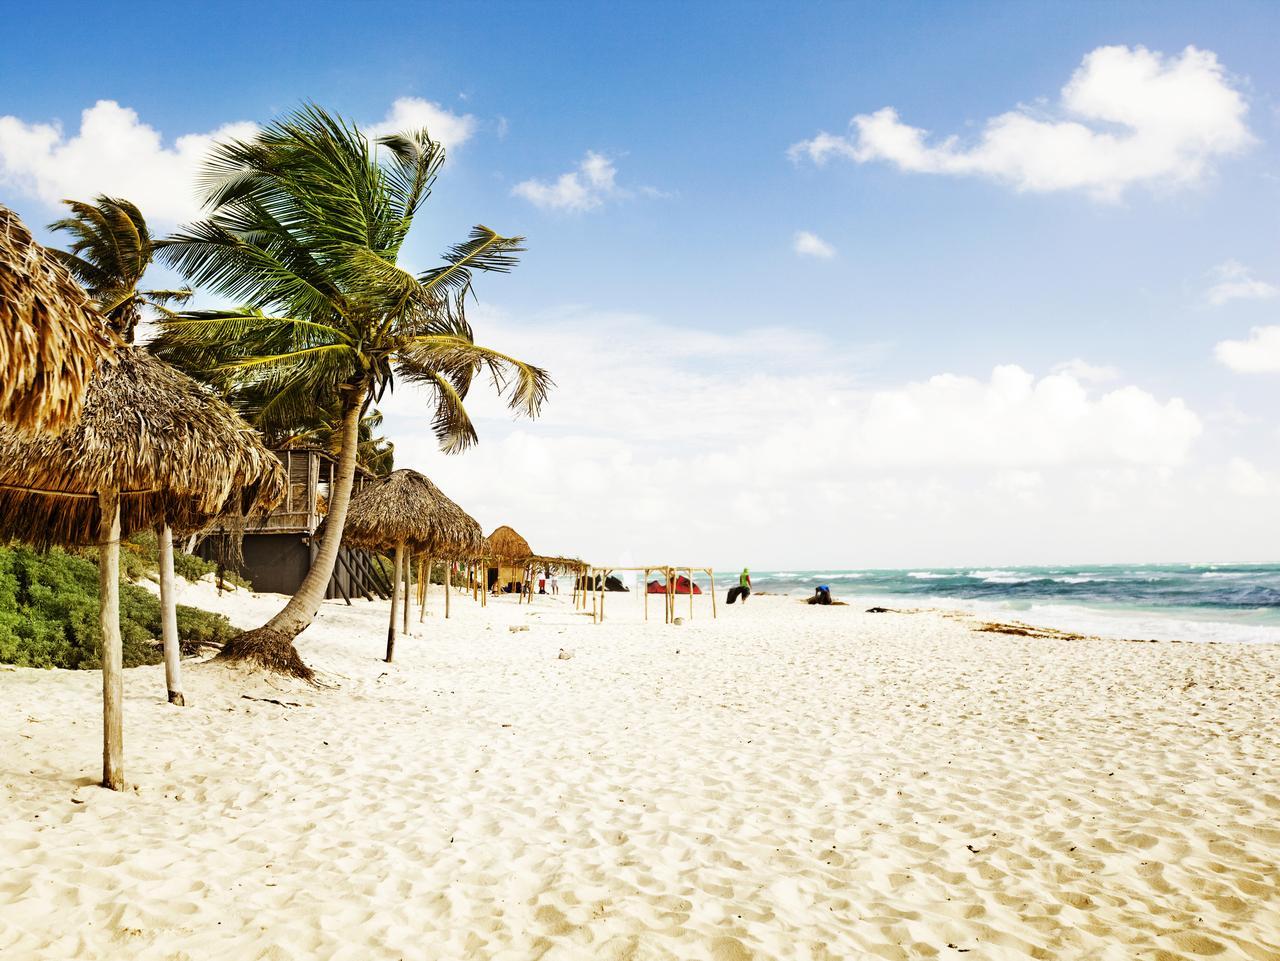 Tulum beach. Tulum, Quintana Roo, Mexico